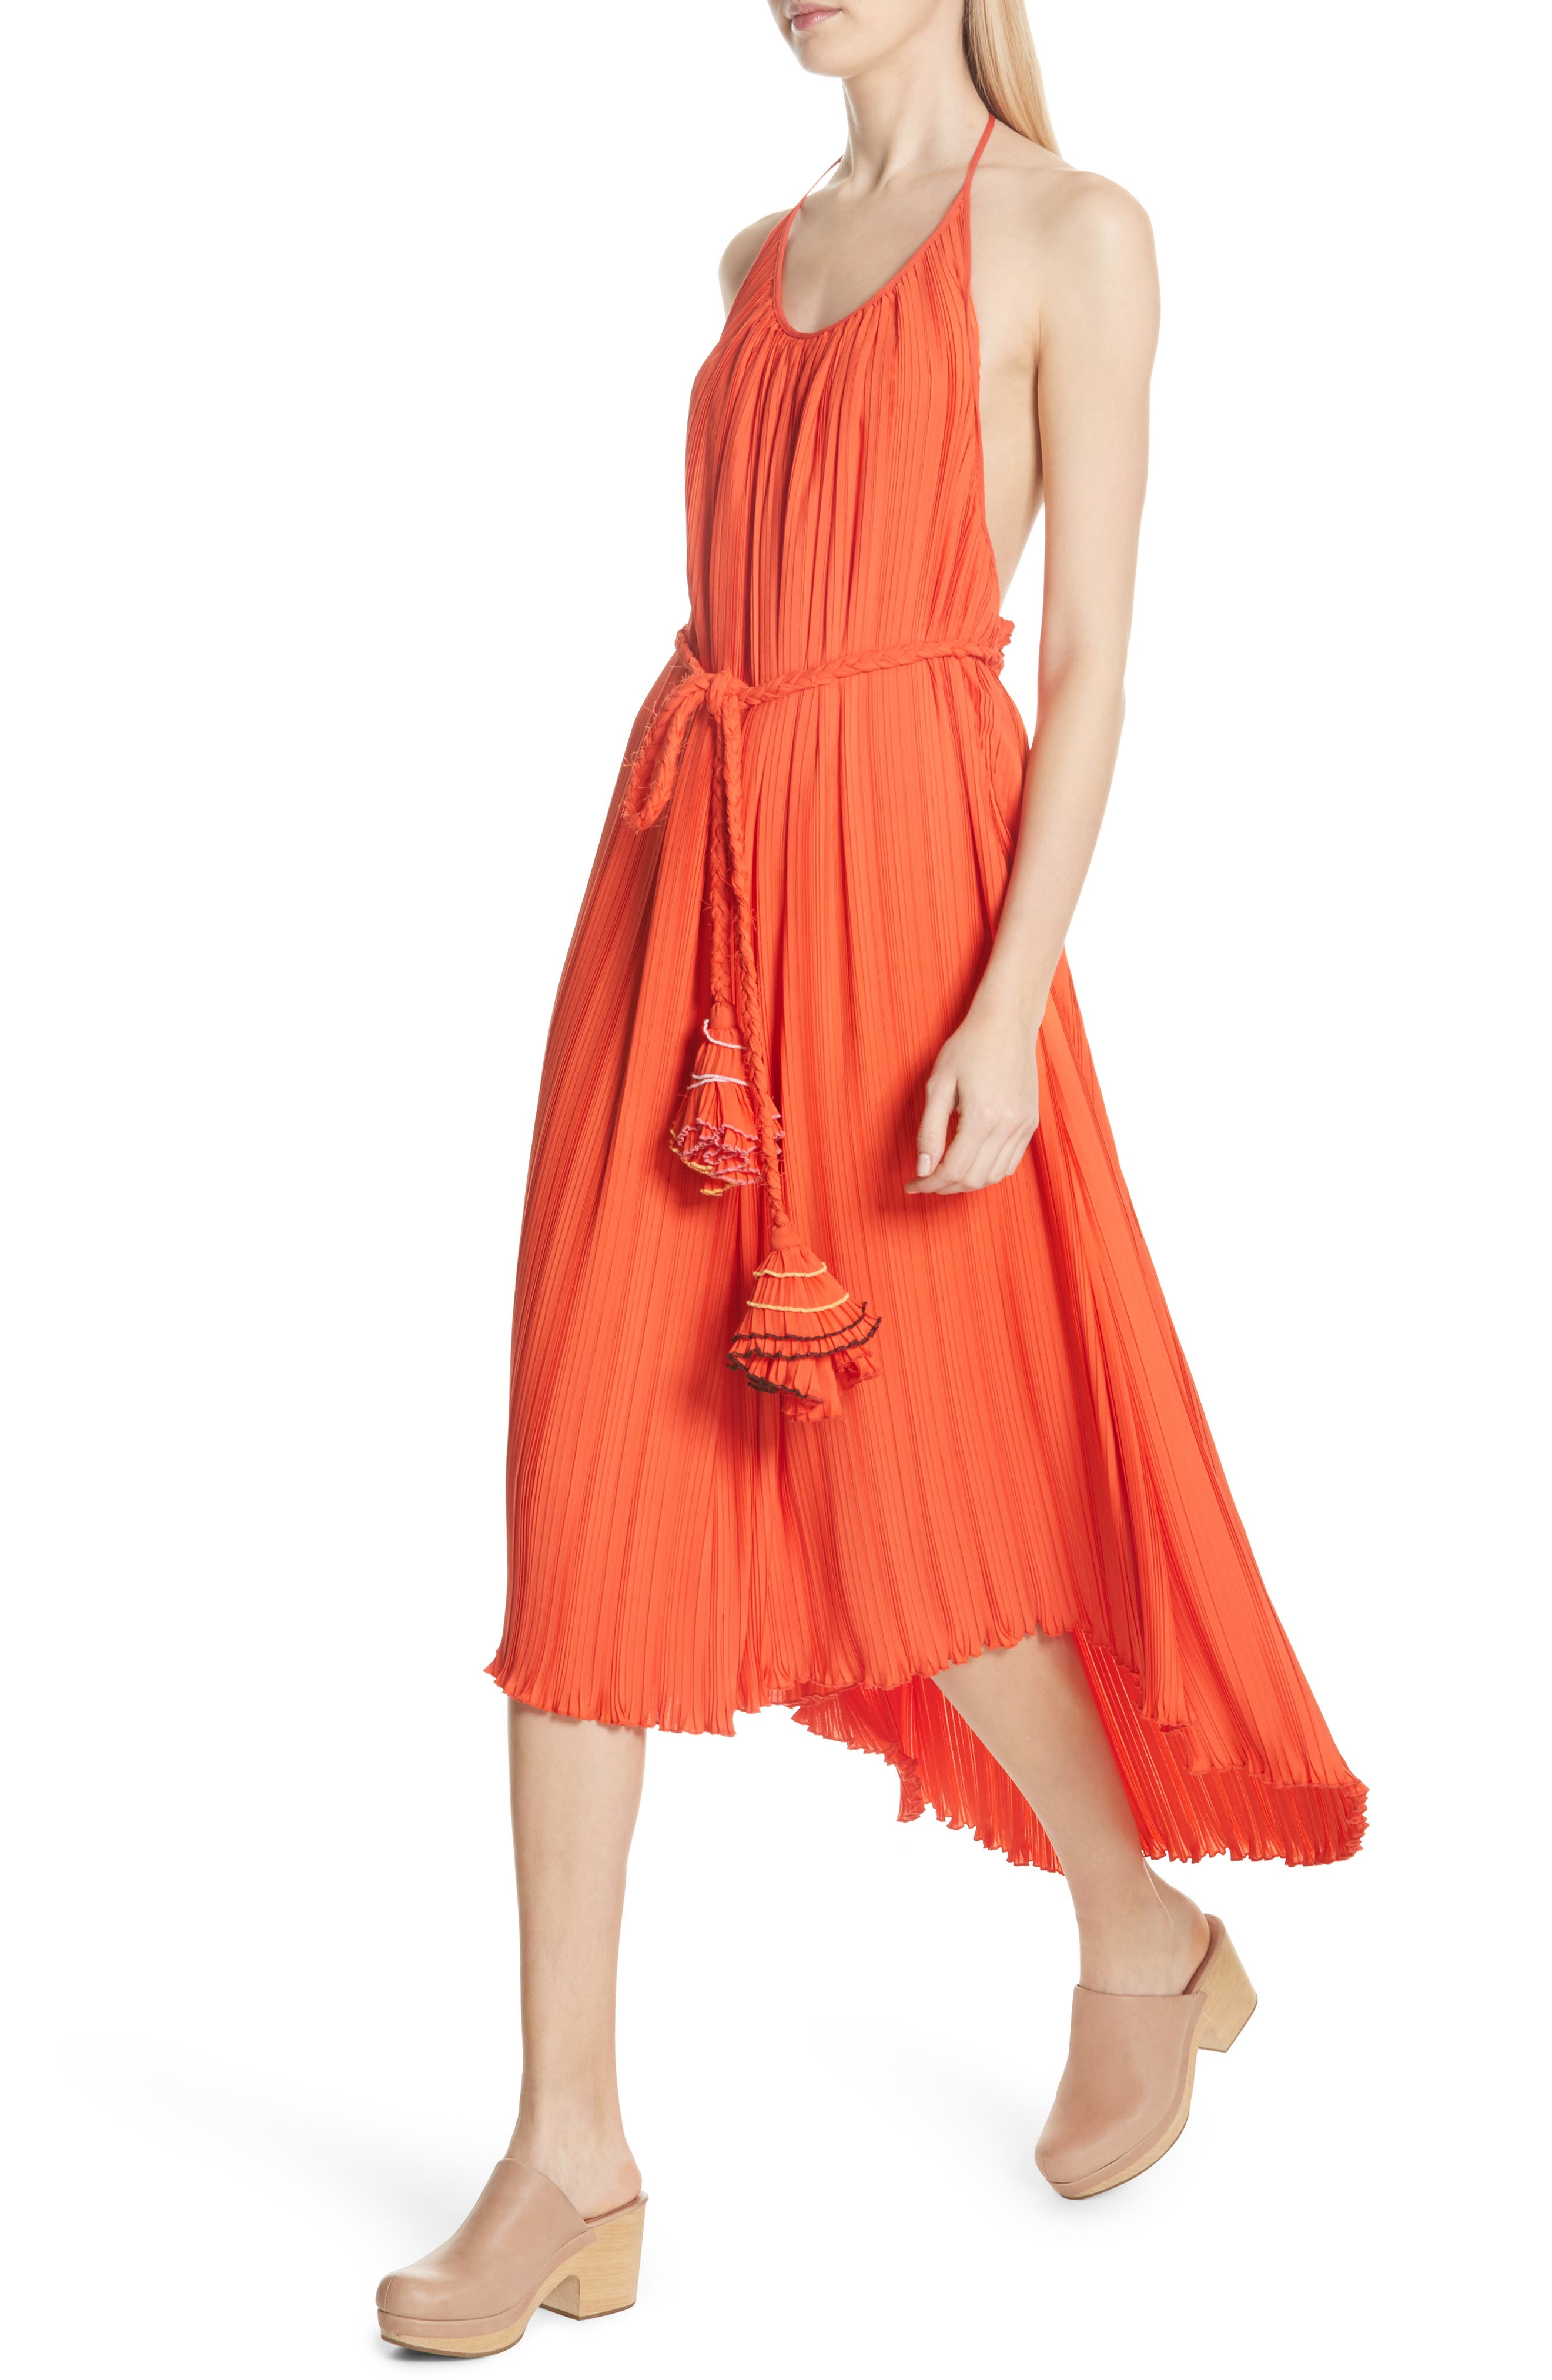 RACHEL COMEY,                             Sambuca Halter Dress,                             Alternate thumbnail 4, color,                             959